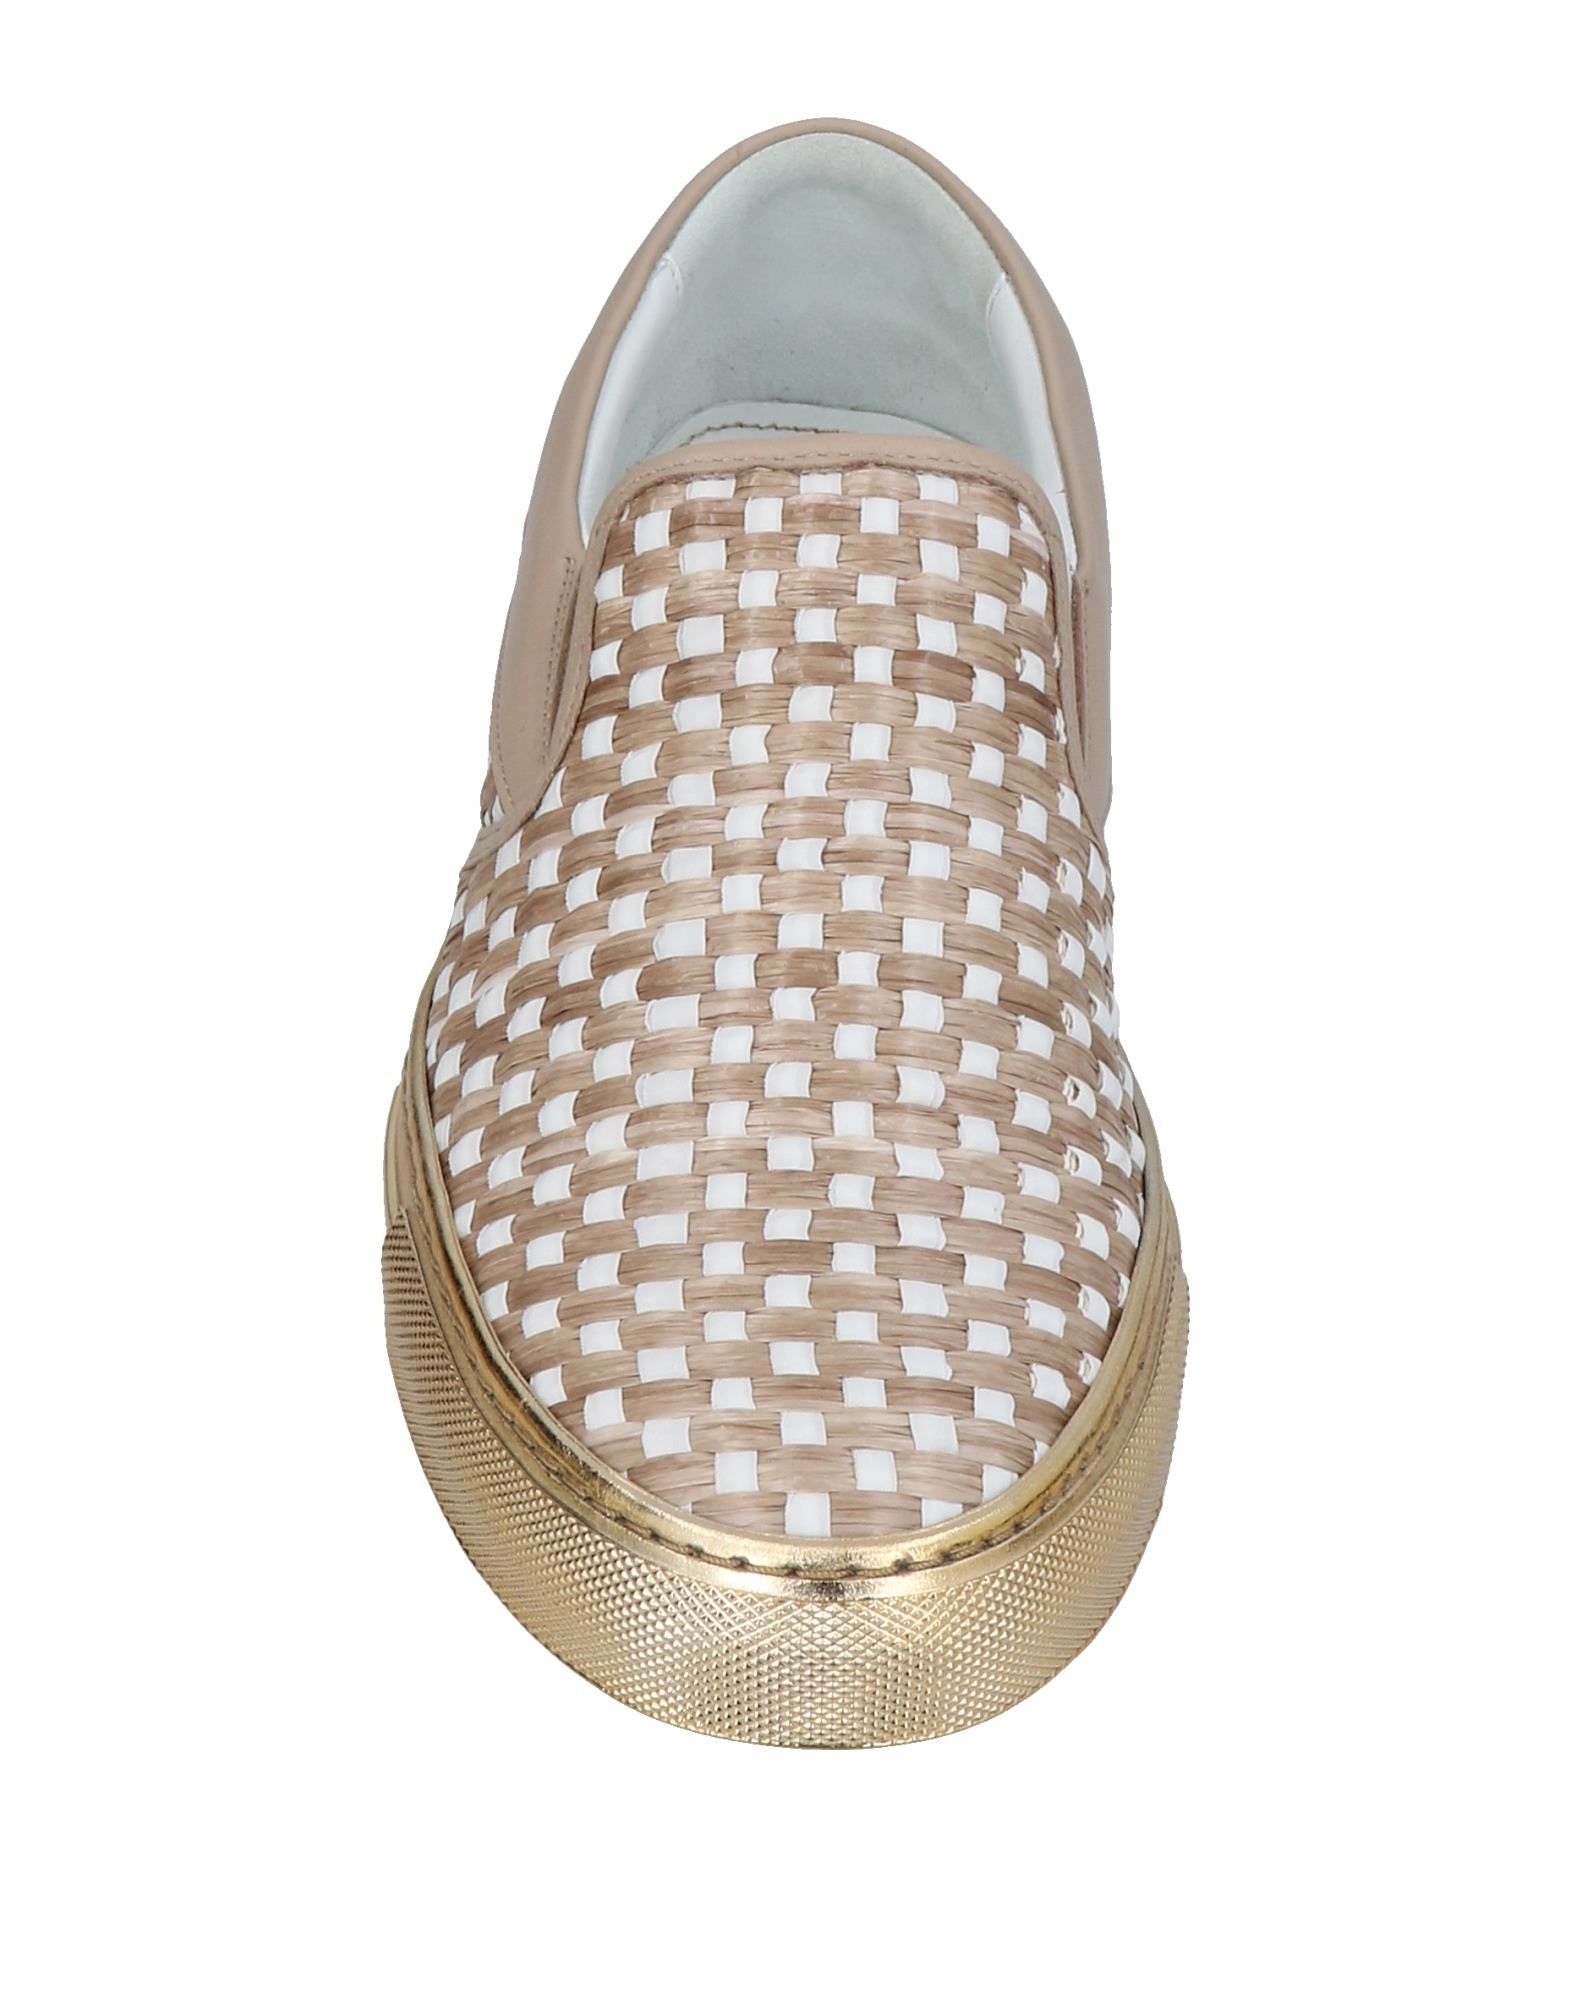 Stilvolle billige Schuhe  Sonia Rykiel Sneakers Damen  Schuhe 11454633RG 986cae